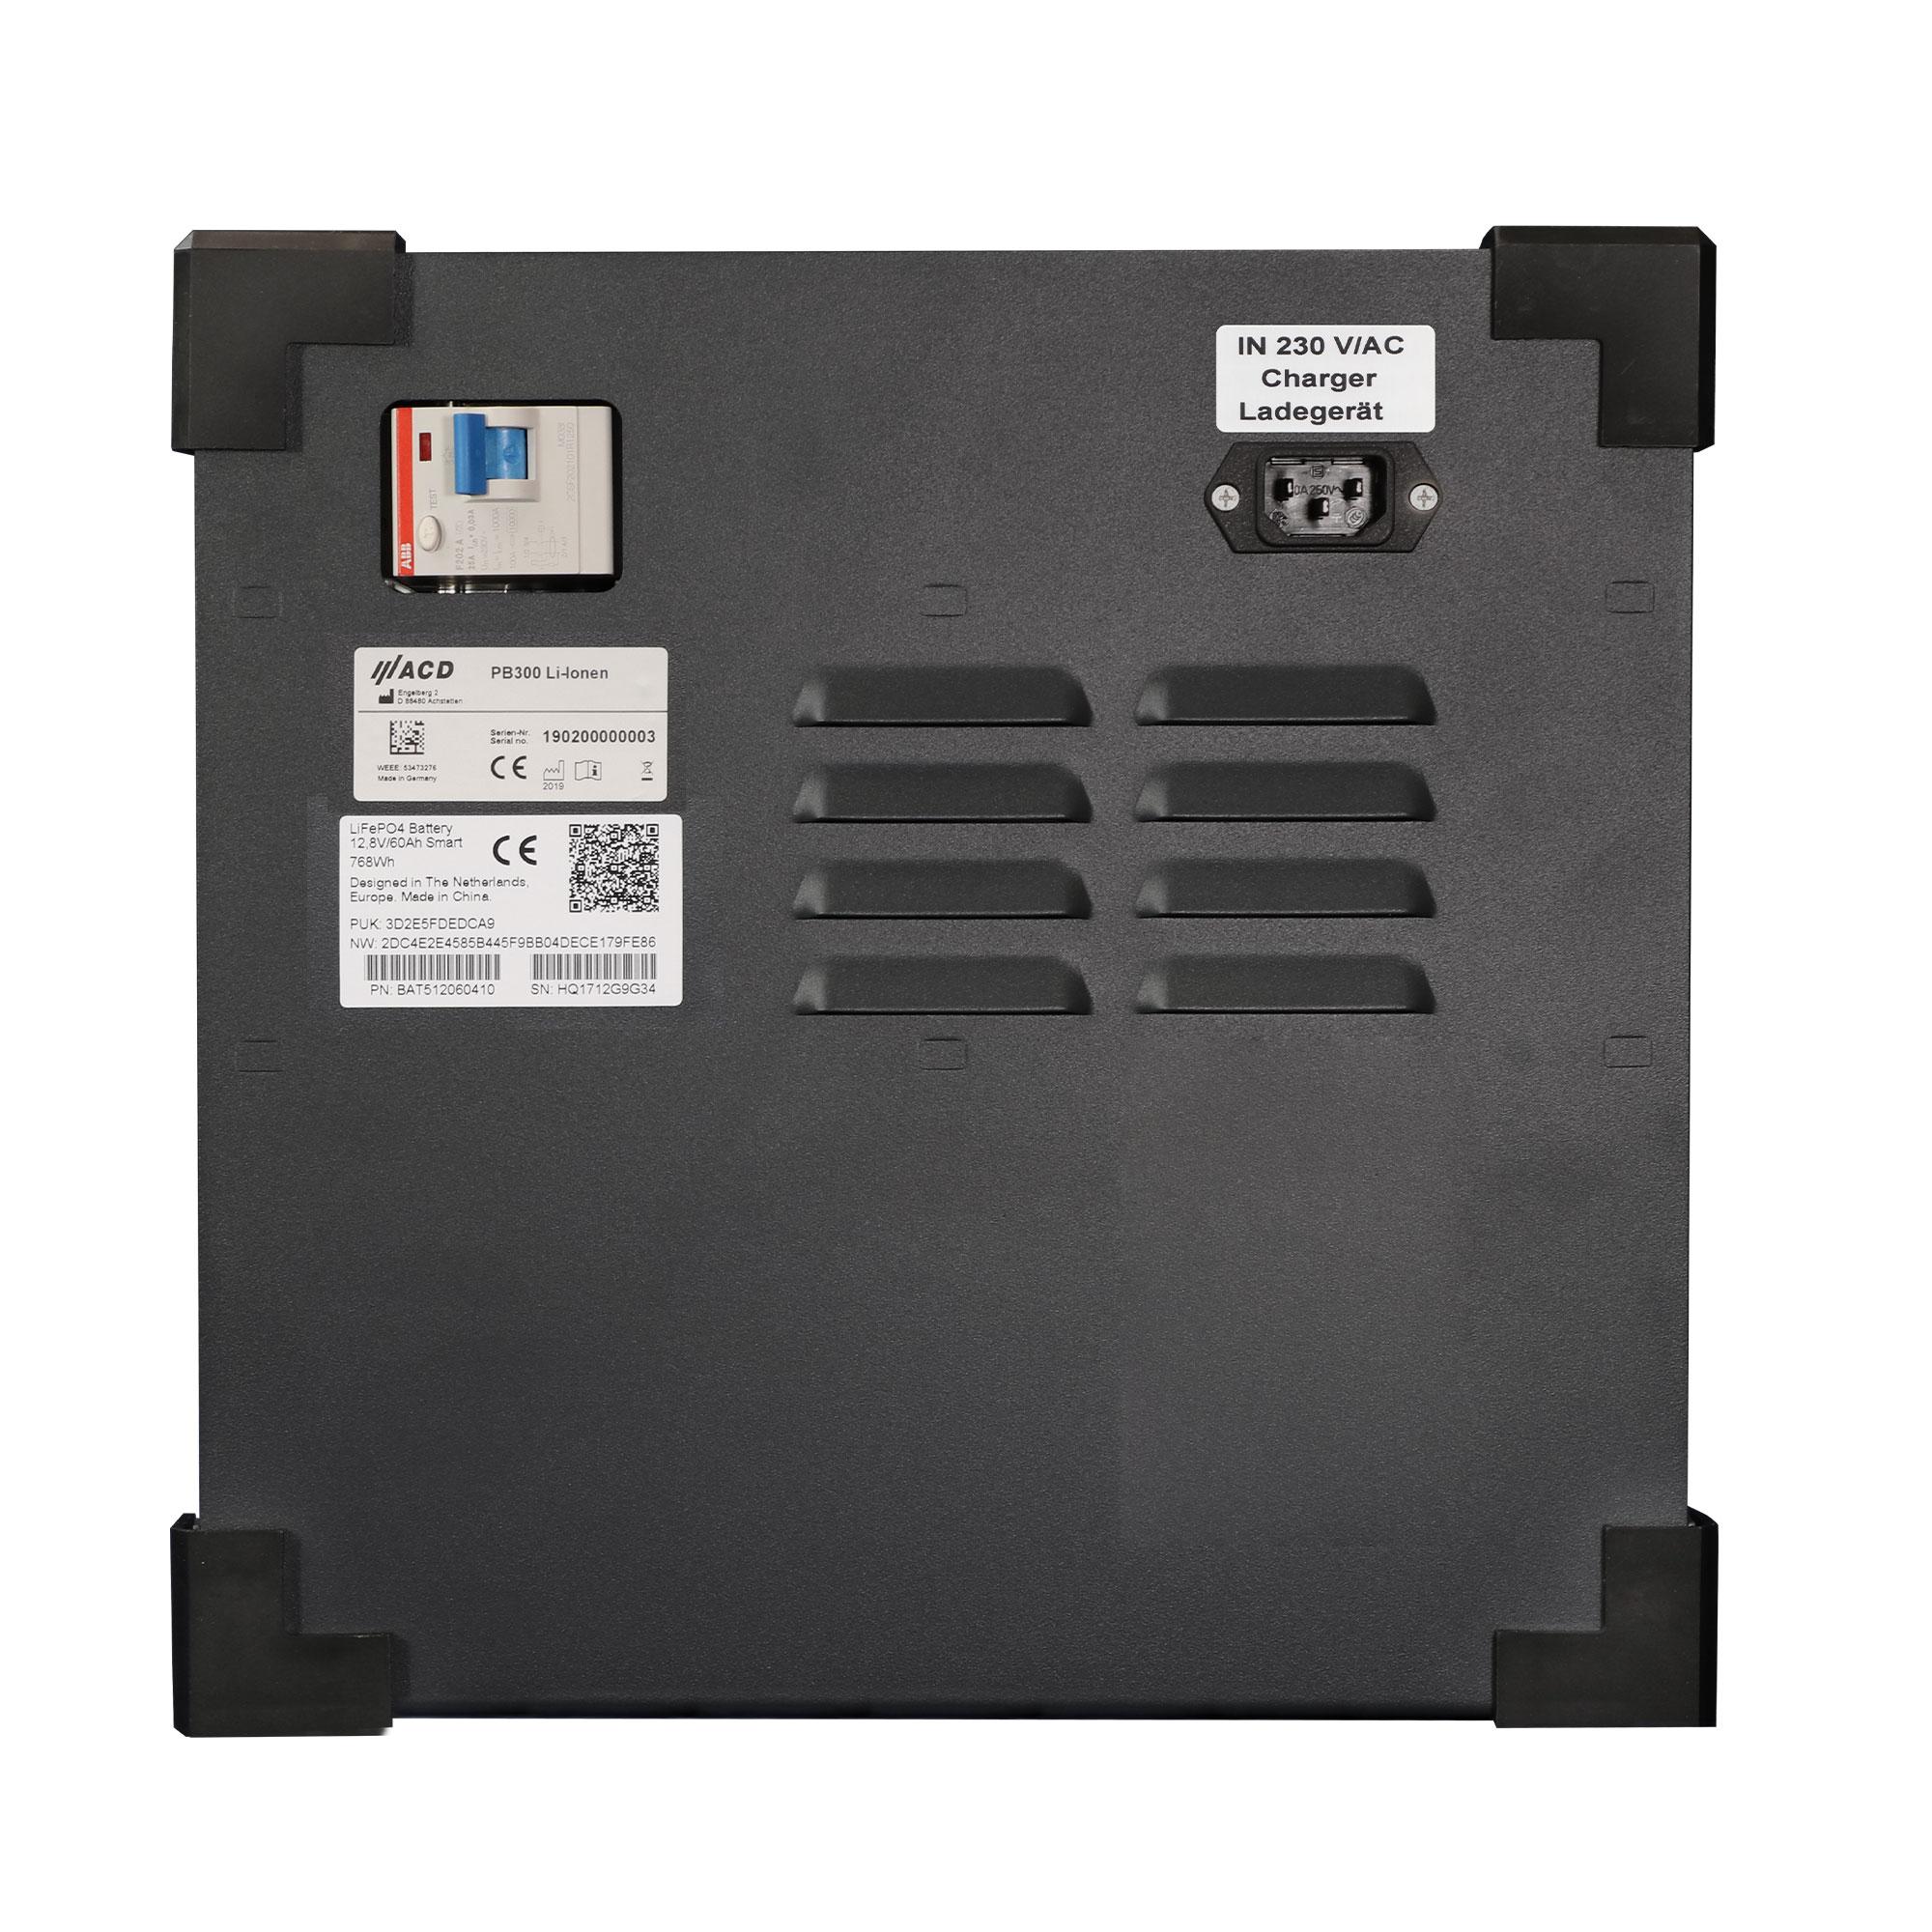 PowerBox PB300 Li-Ionen